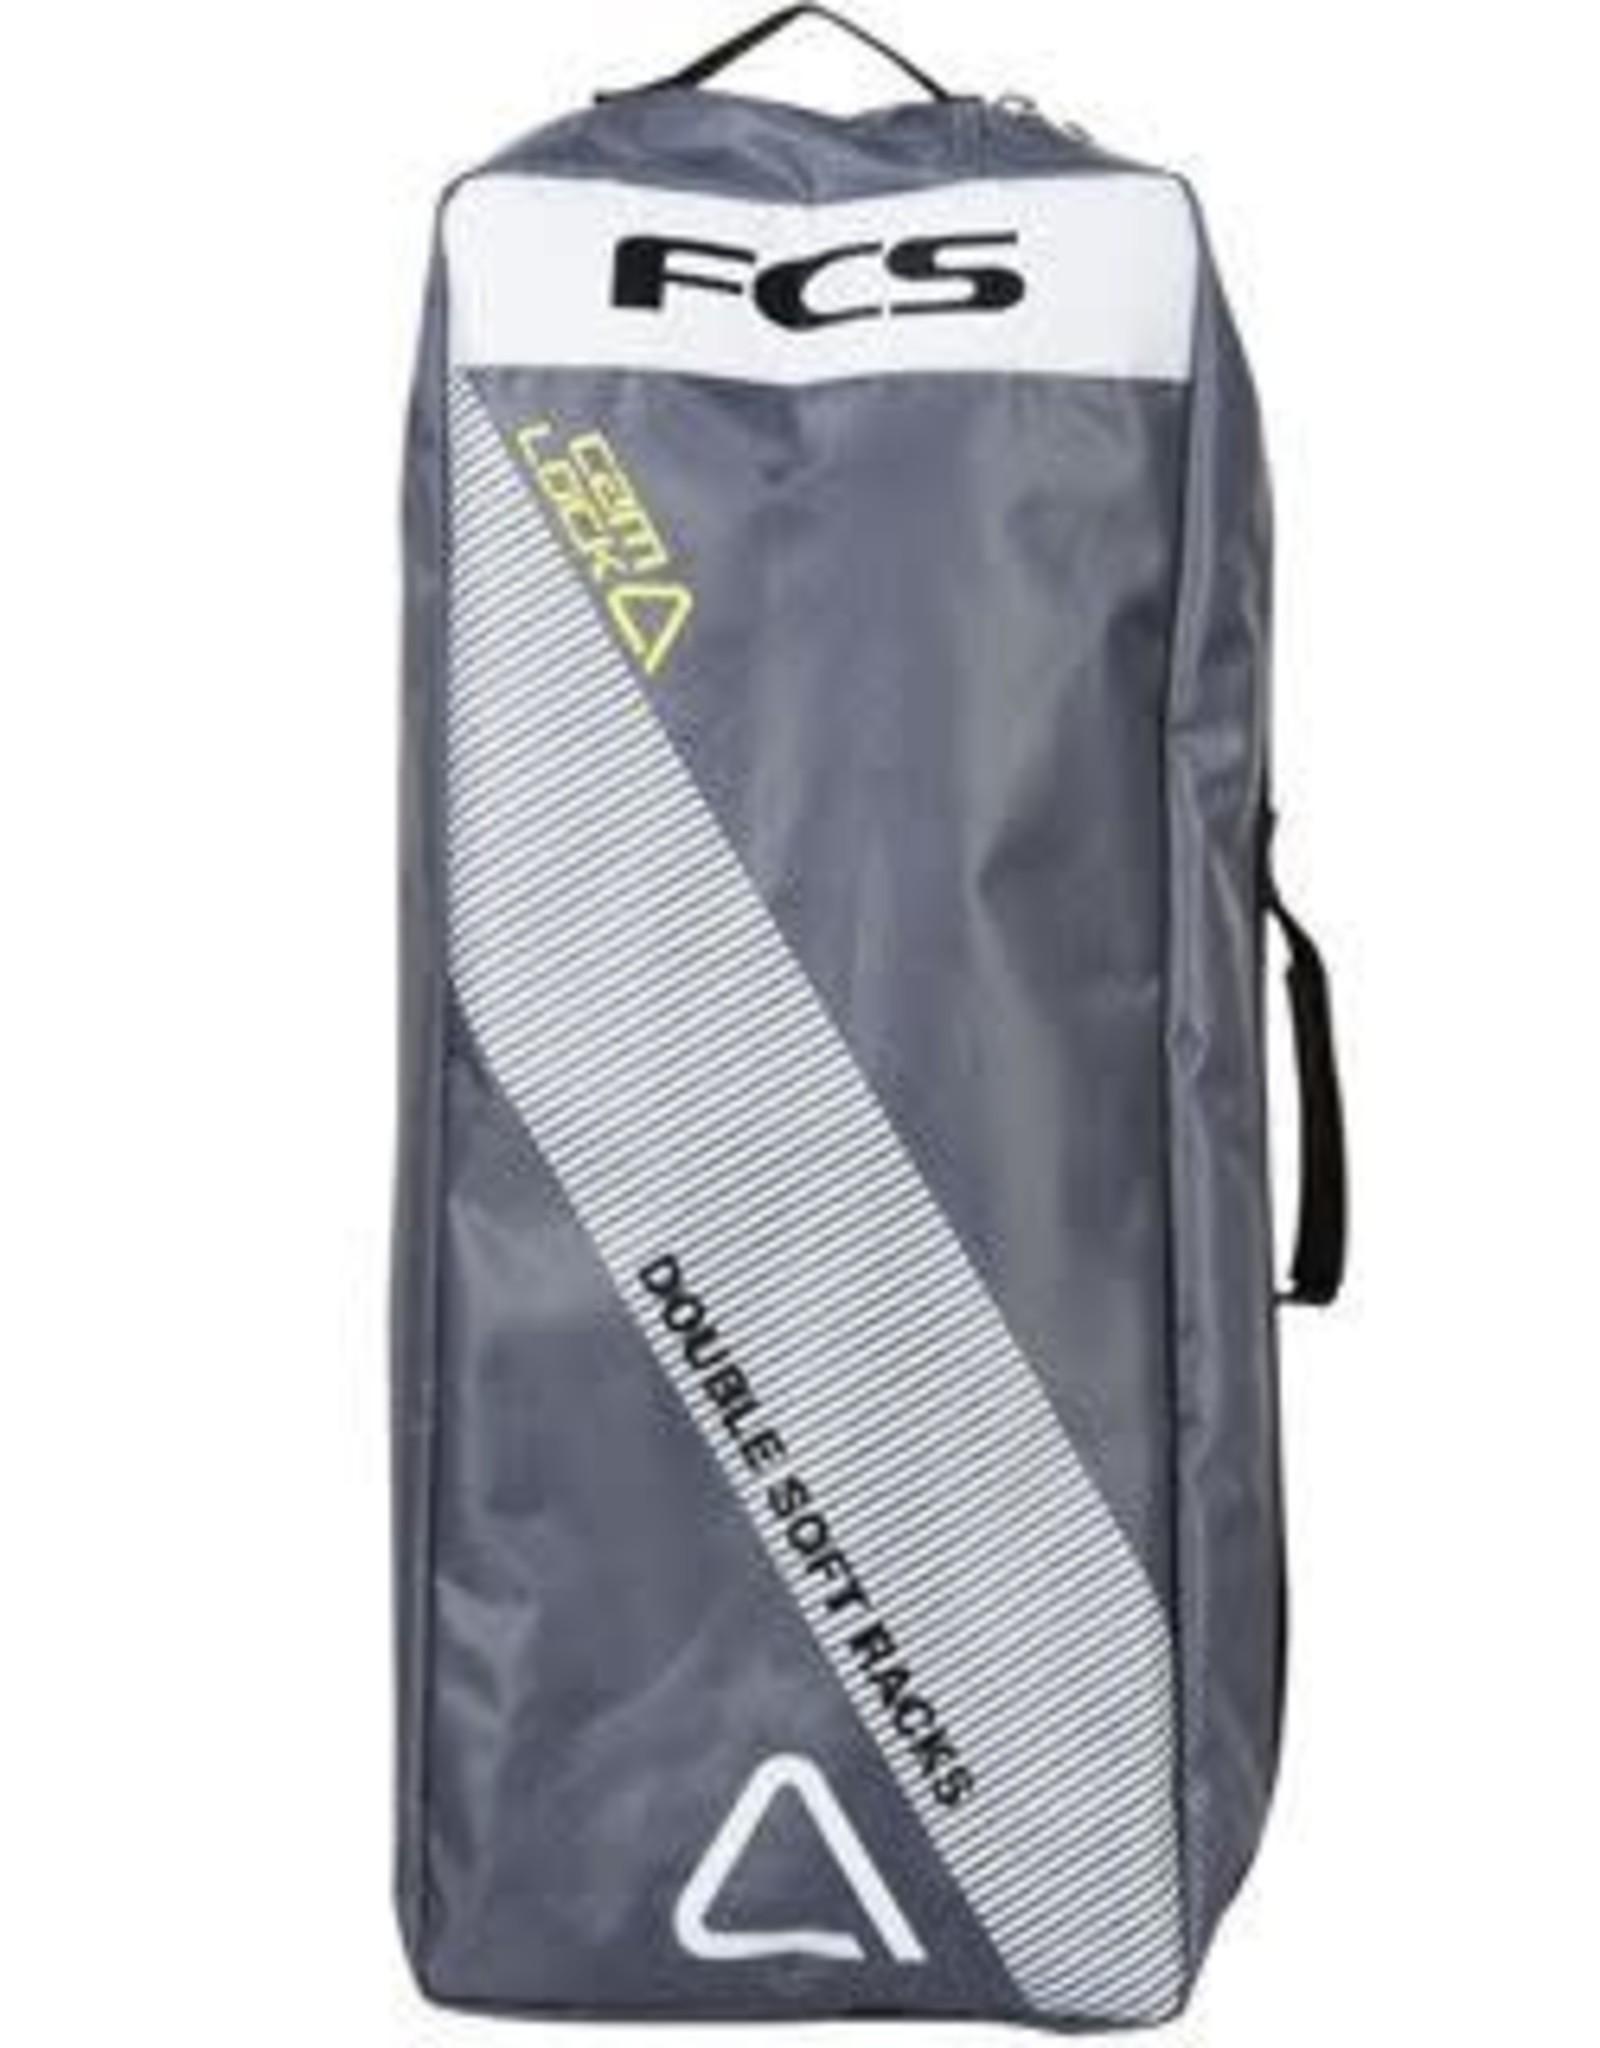 FCS FCS Double Soft Racks - Cam Lock